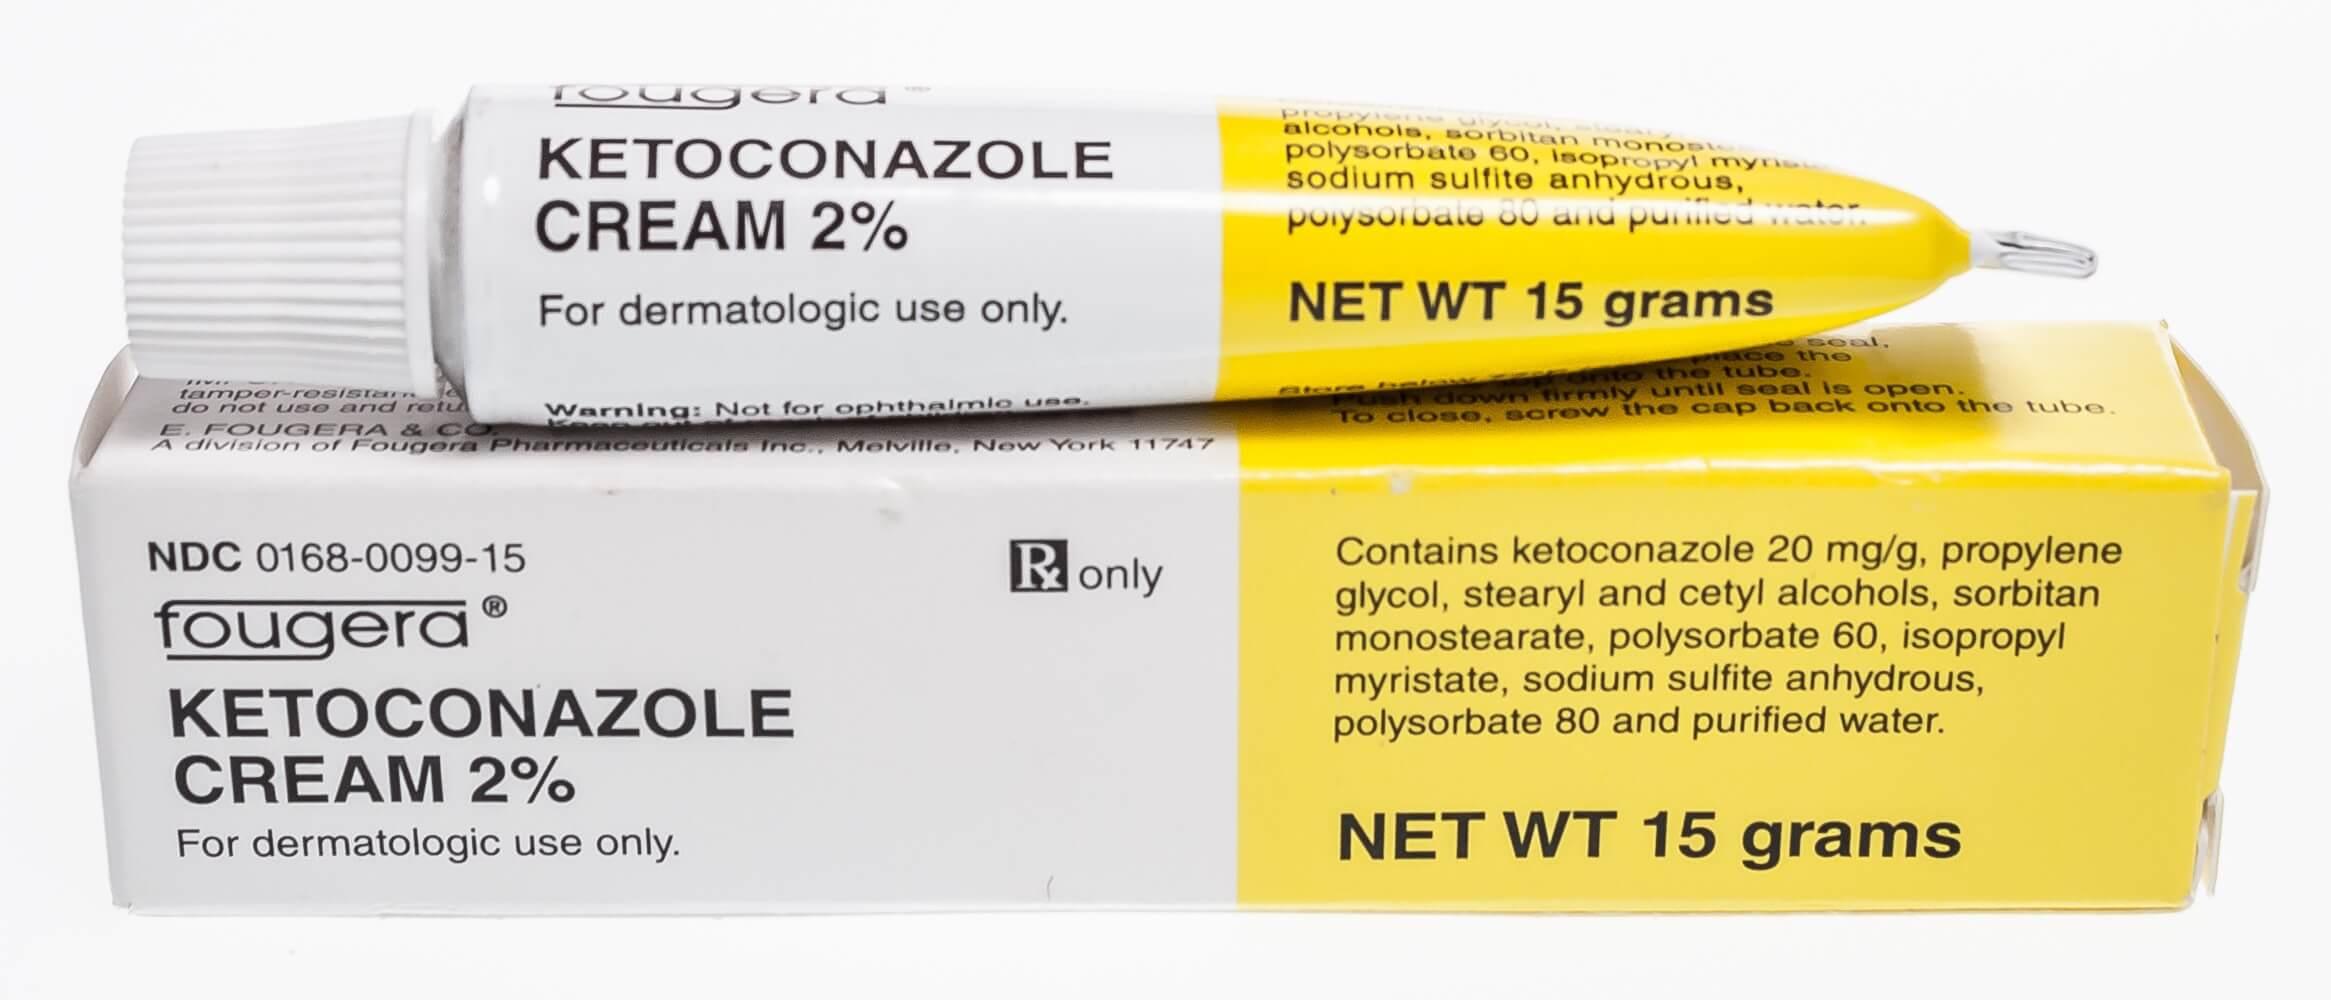 Nizoral Cream Dosage